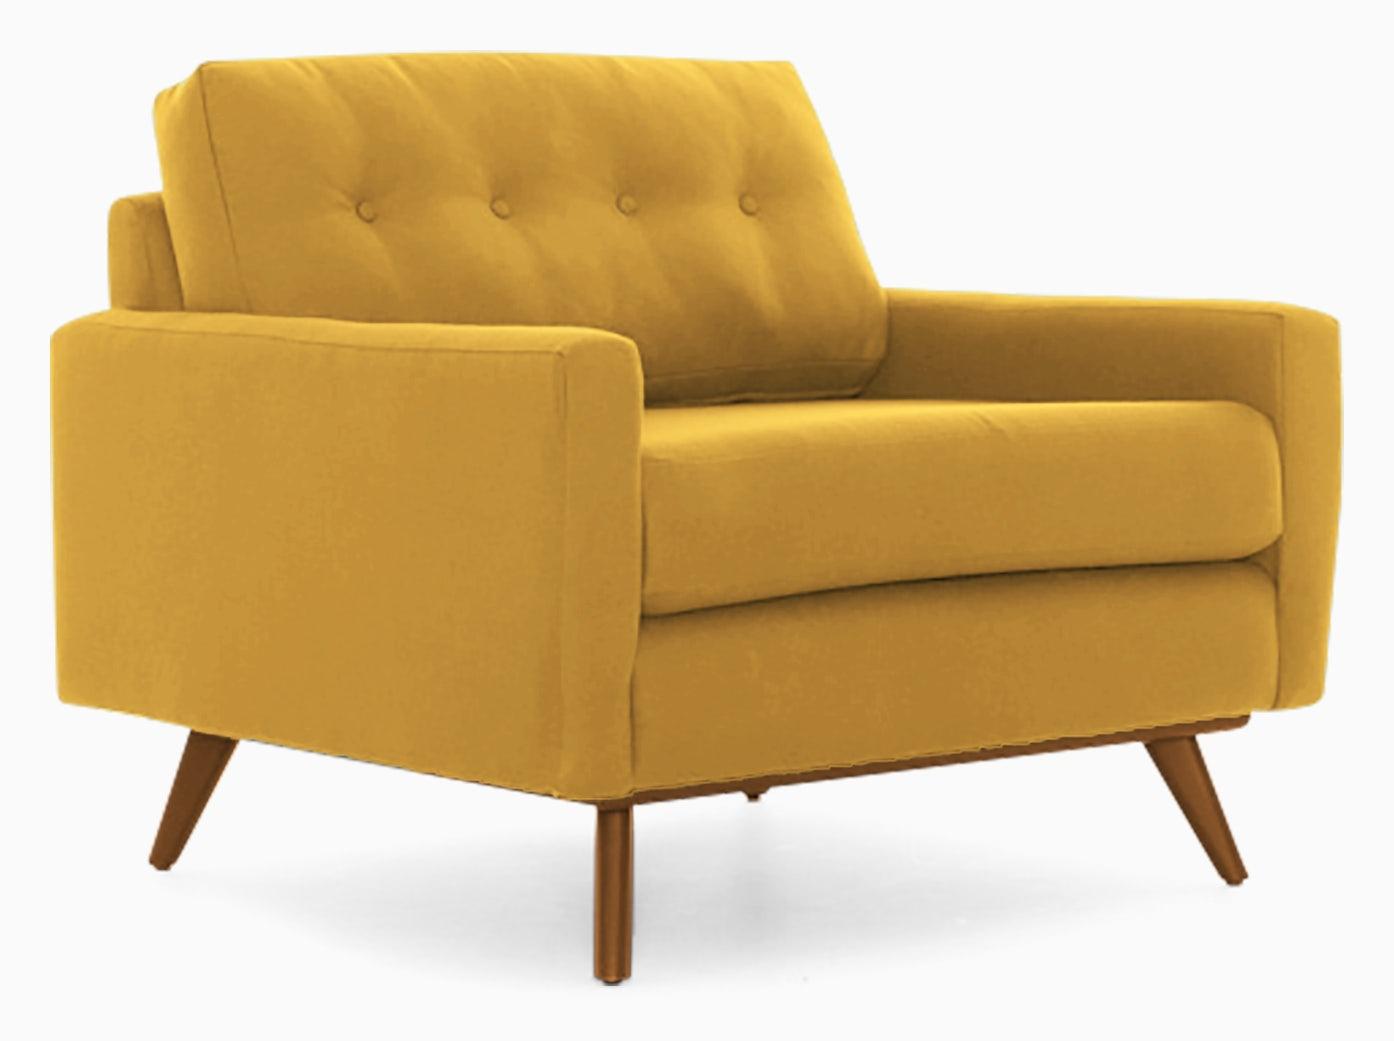 hopson chair bentley daisey